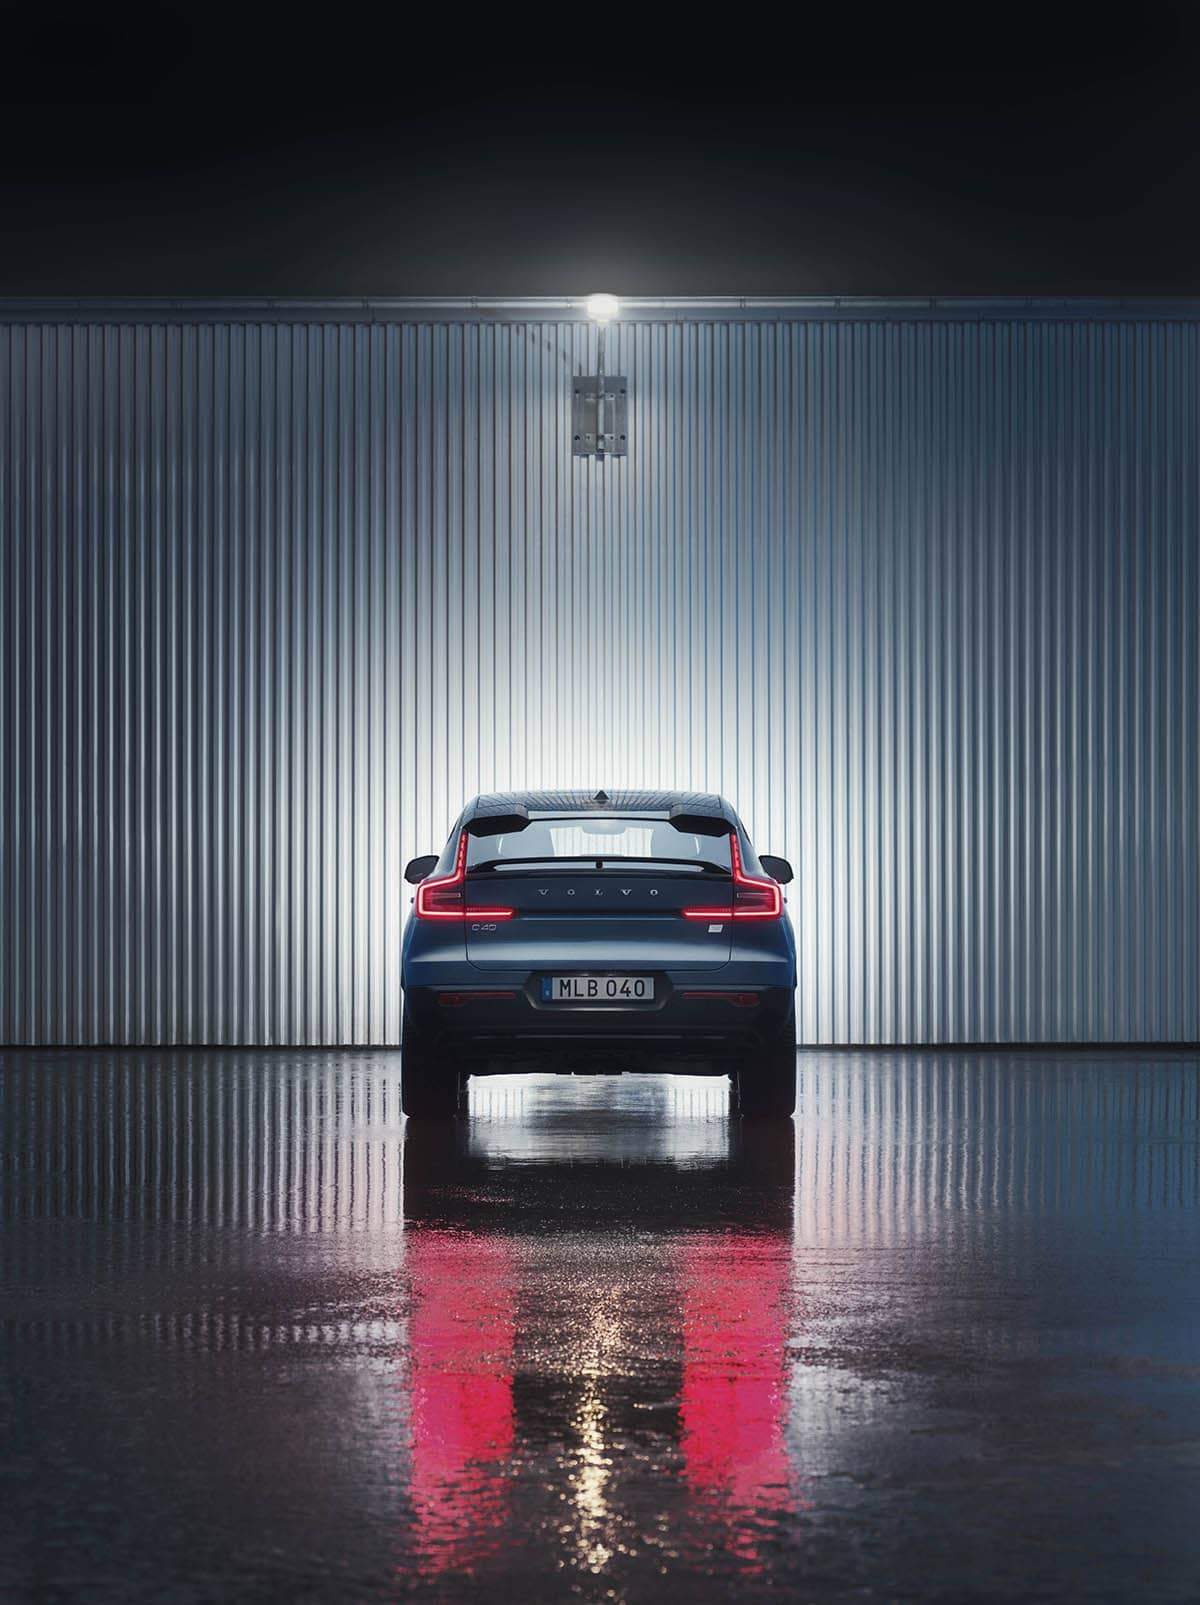 10 Volvo C40Recharge rear night 1 carro elétrico, Crossover, mobilidade elétrica, SUV, Volvo, Volvo C40 Recharge